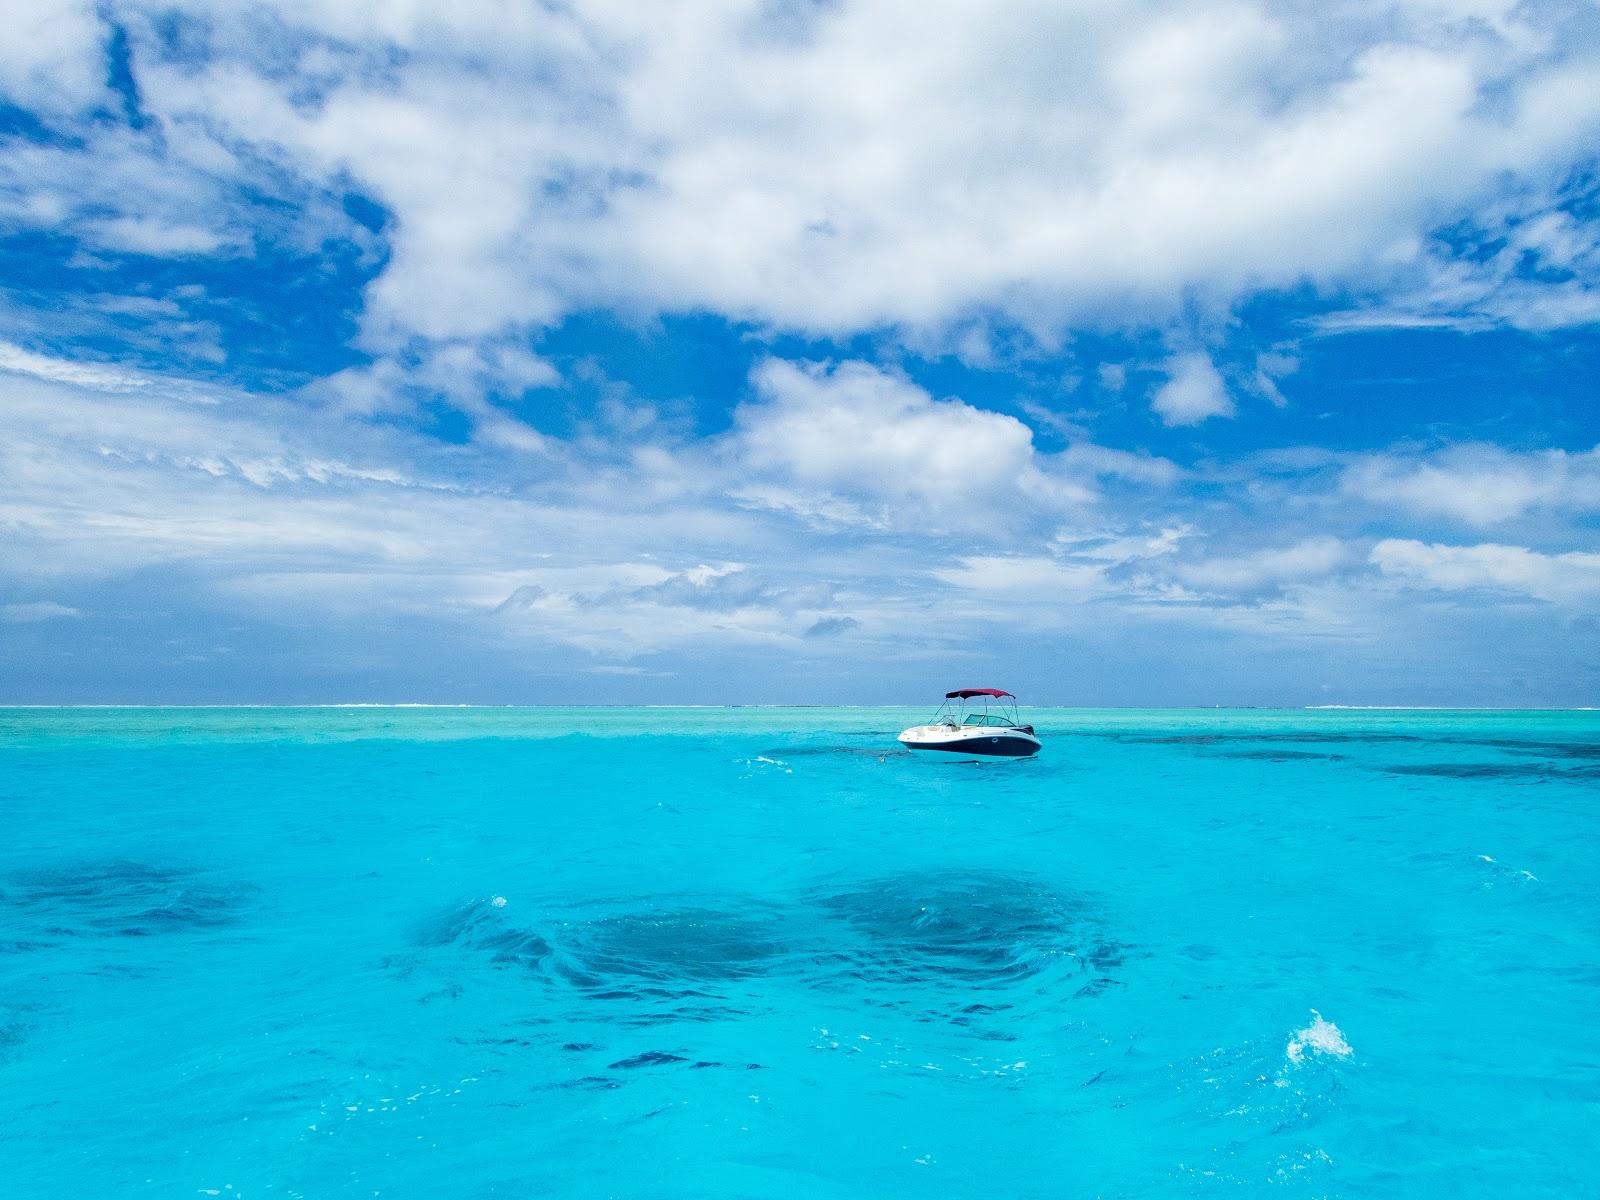 Aquarium Snorkeling Location @ Bora Bora, Tahiti